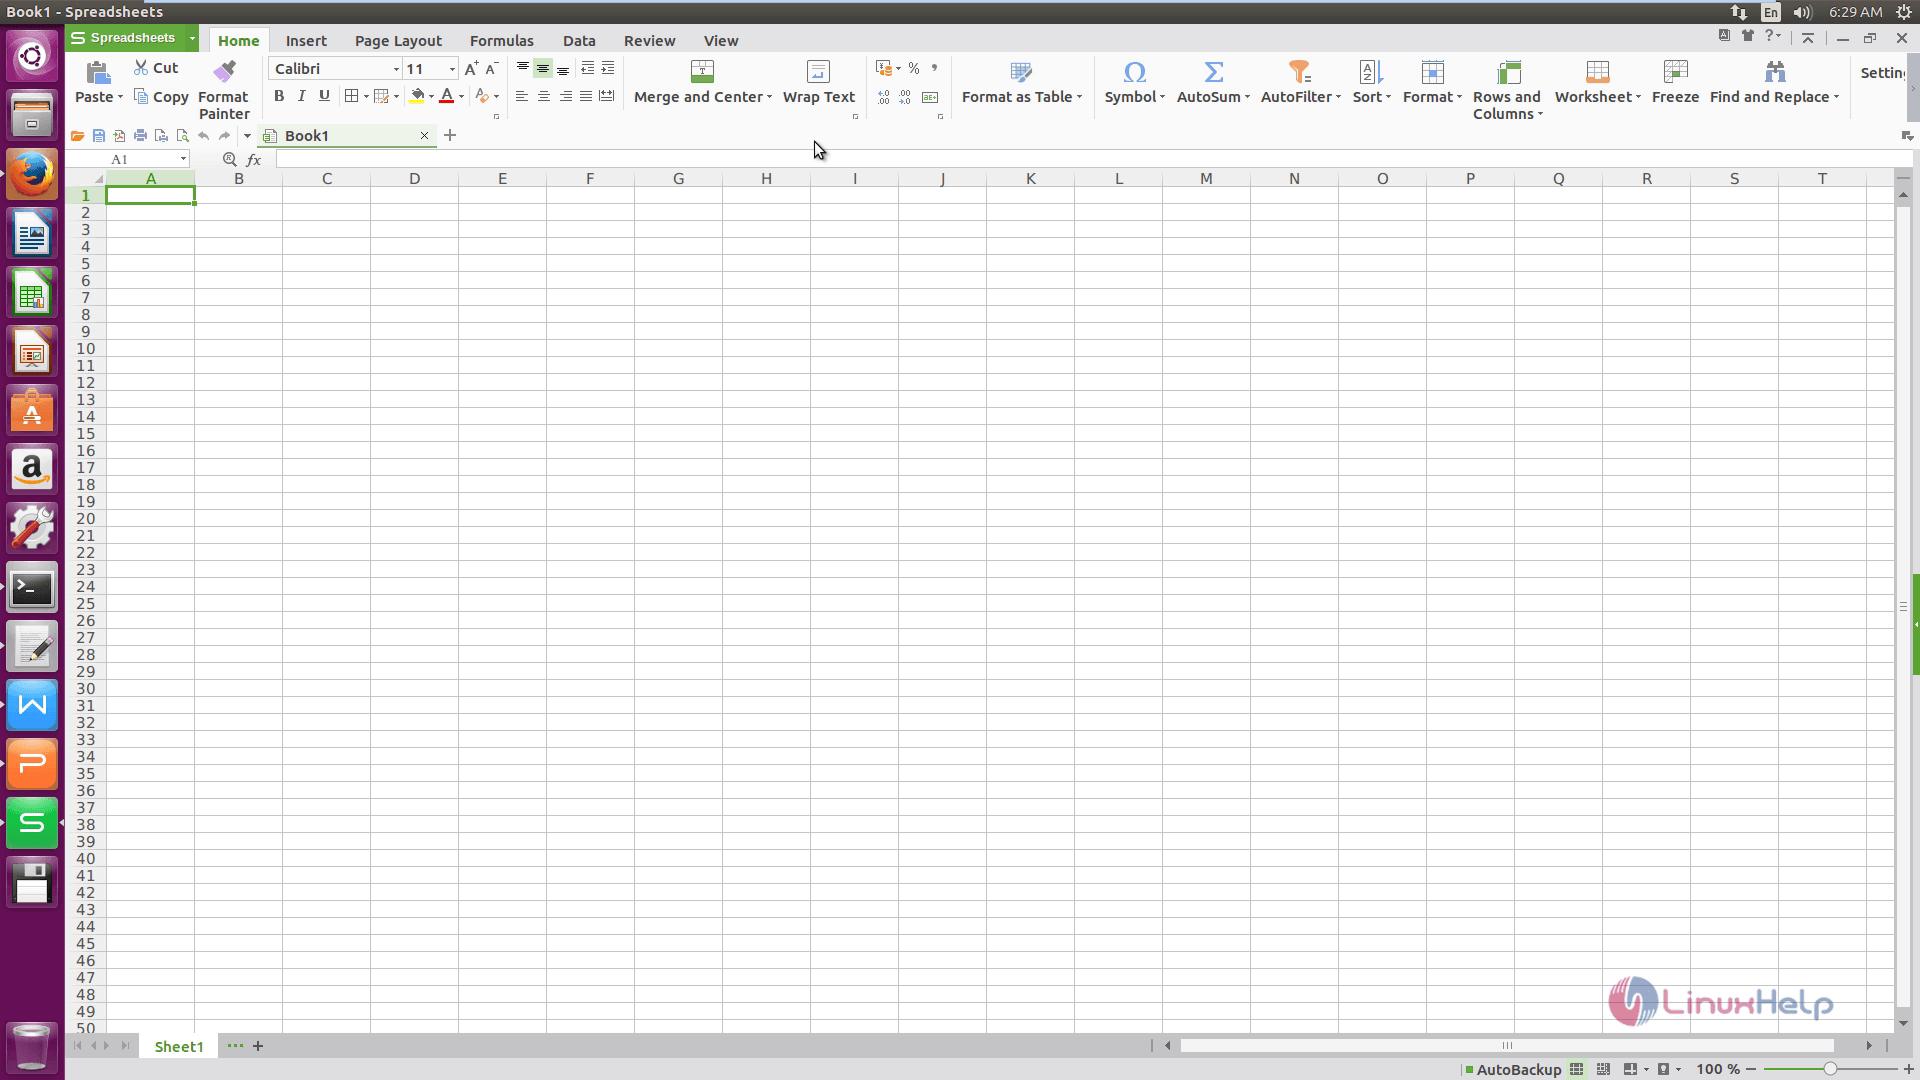 Wps Spreadsheet Tutorial Pdf Inside How To Install Kingsoft Office In Ubuntu  Linuxhelp Tutorials